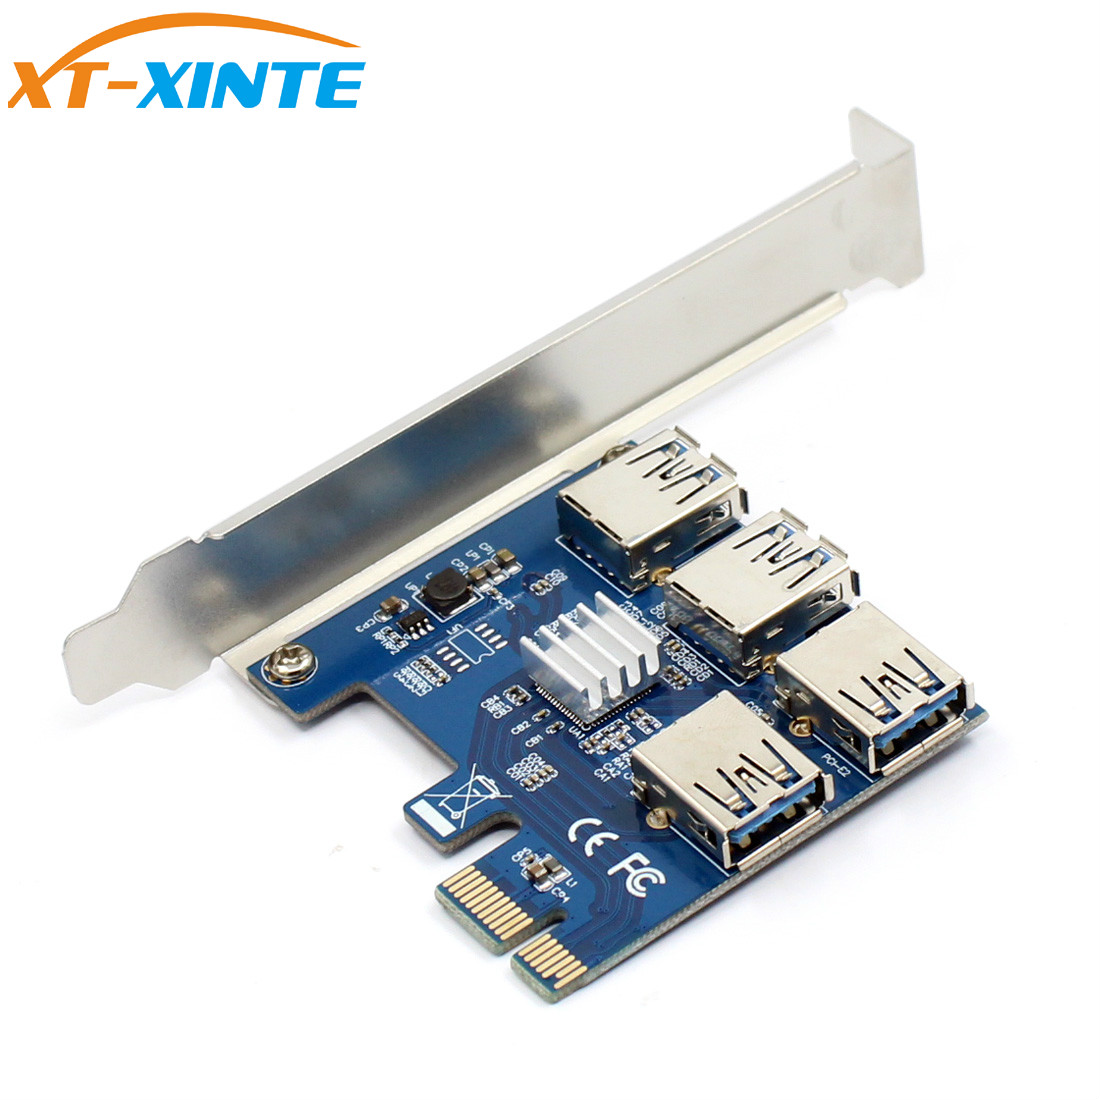 60 cm 1 a 4 PCIe 16X Riser Card PCI-E PCIe 1X a 4 USB 3.0 PCI-E Riser Adattatore Porta multiplier Scheda per BTC Bitcoin Miner Mining